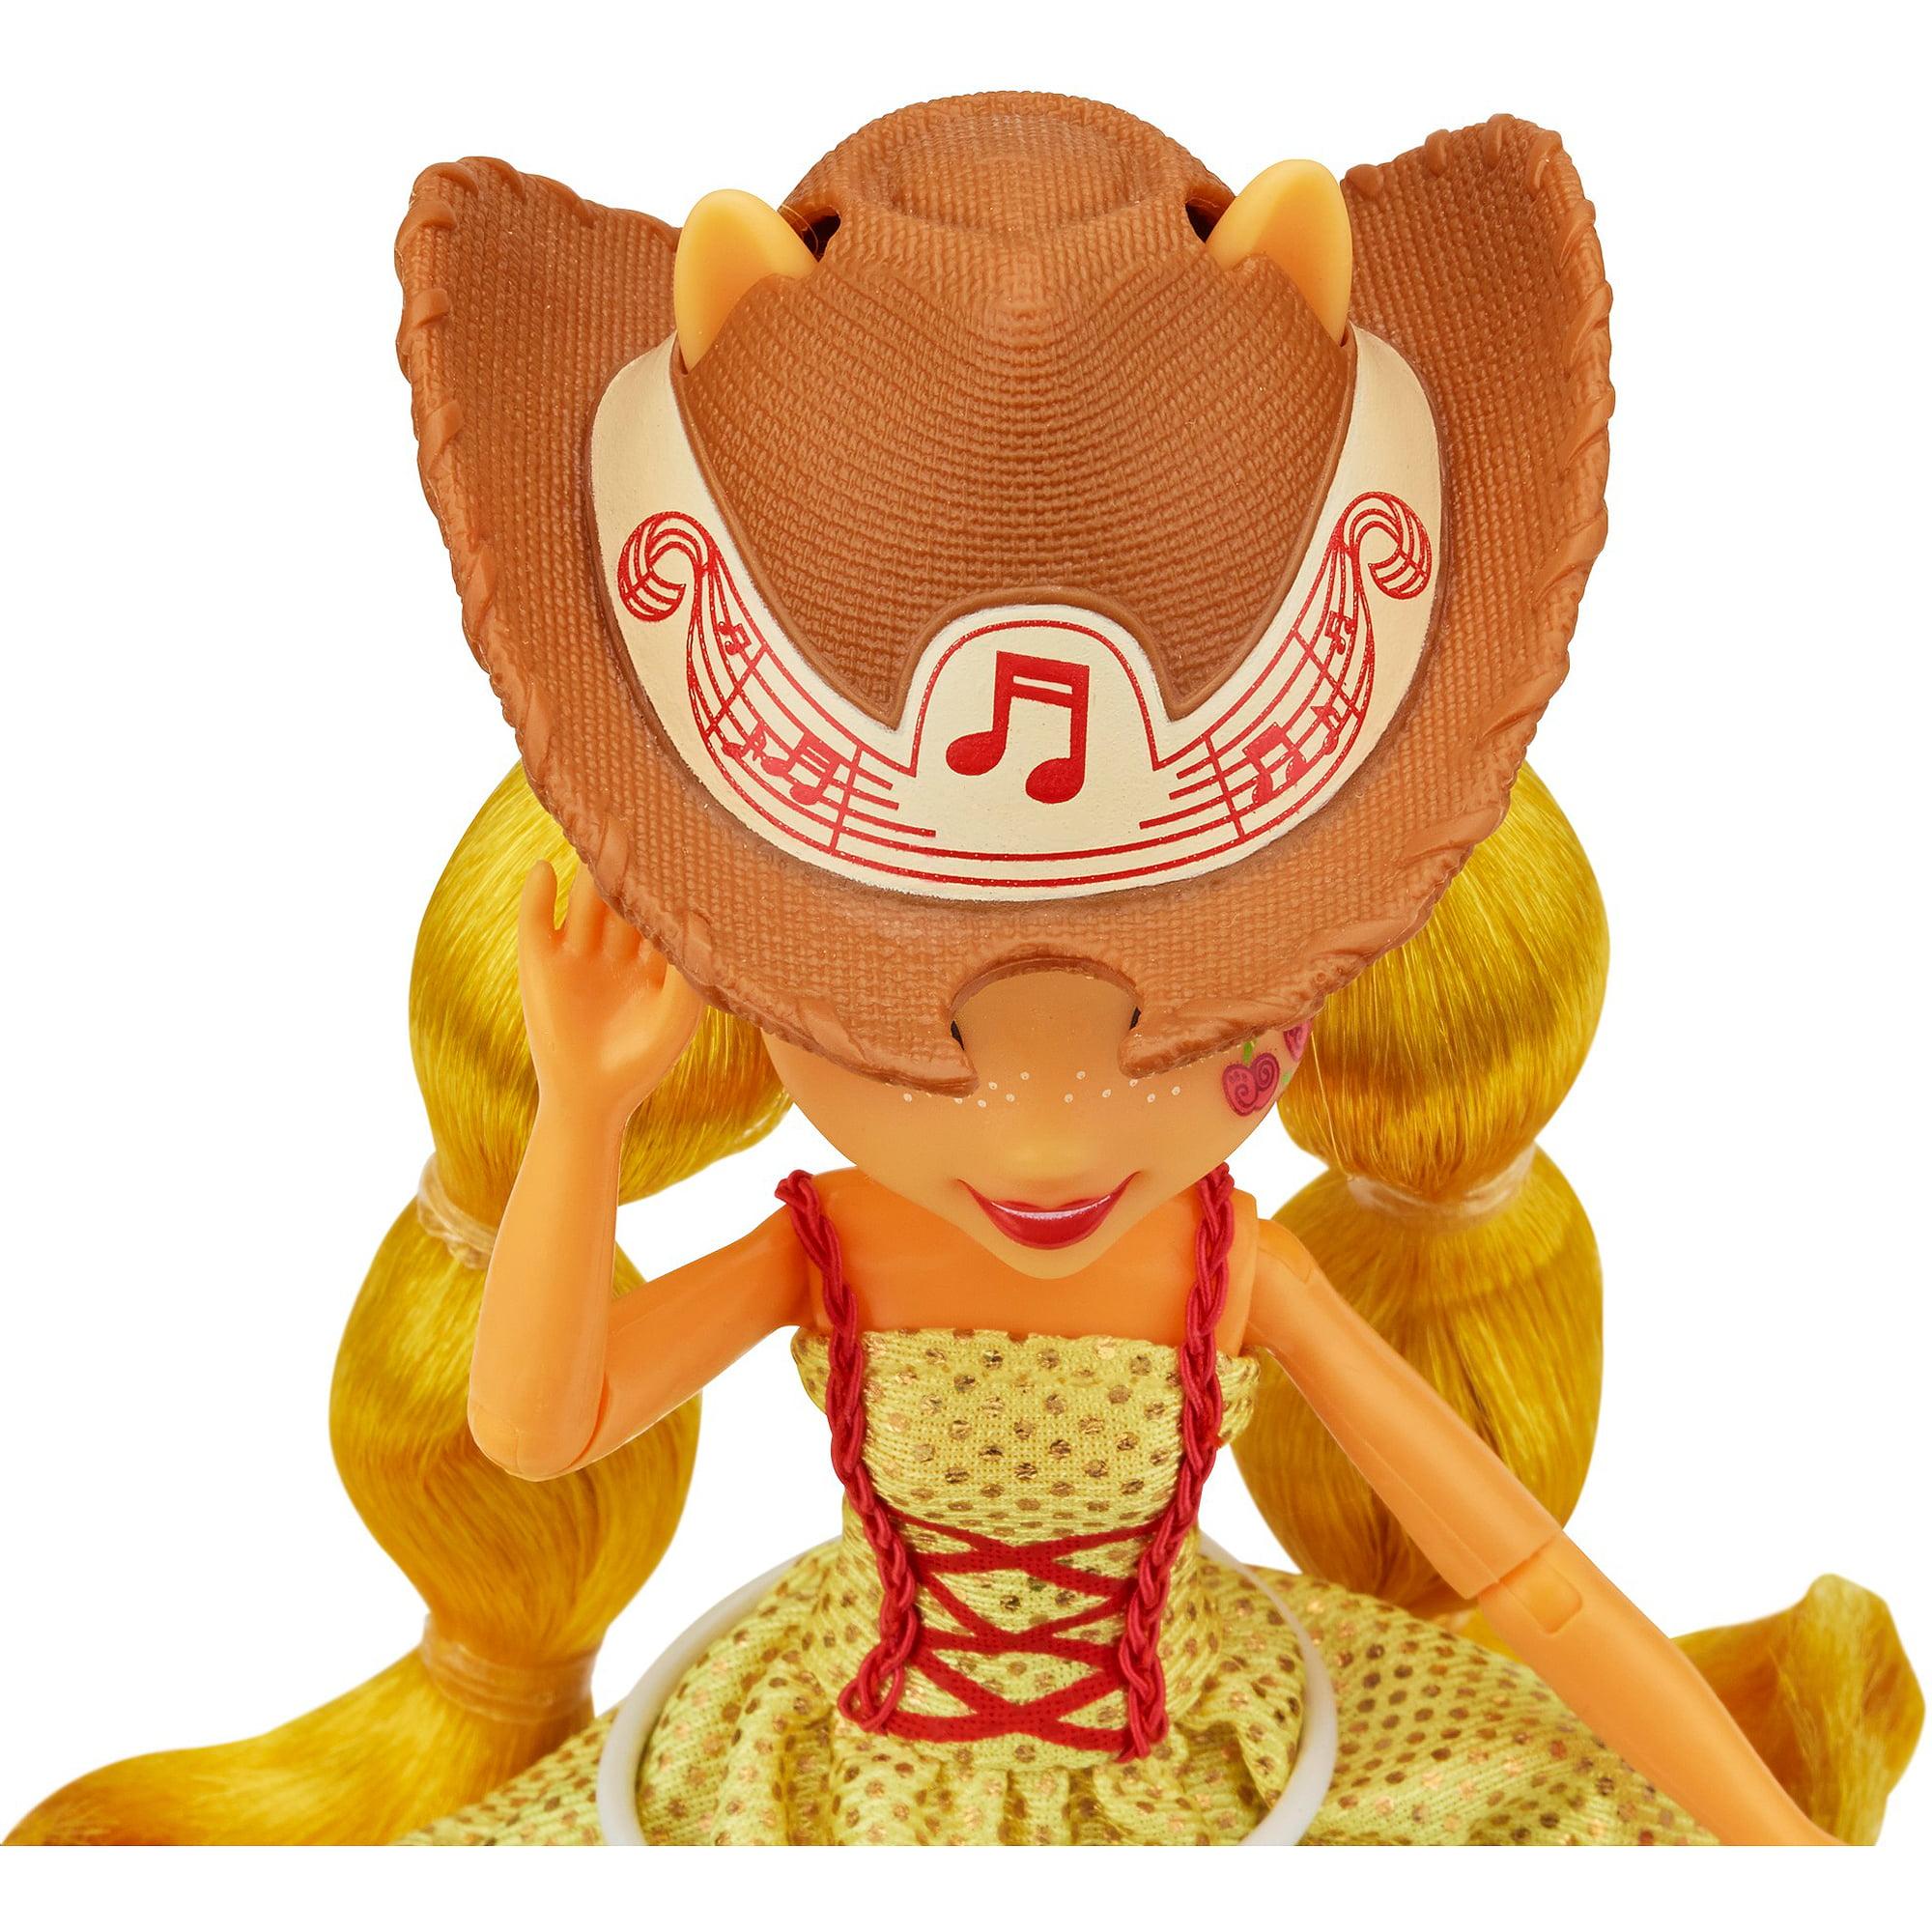 My Little Pony Equestria Girls Rainbow Rocks Applejack Doll - Rockin hairstyles dolls